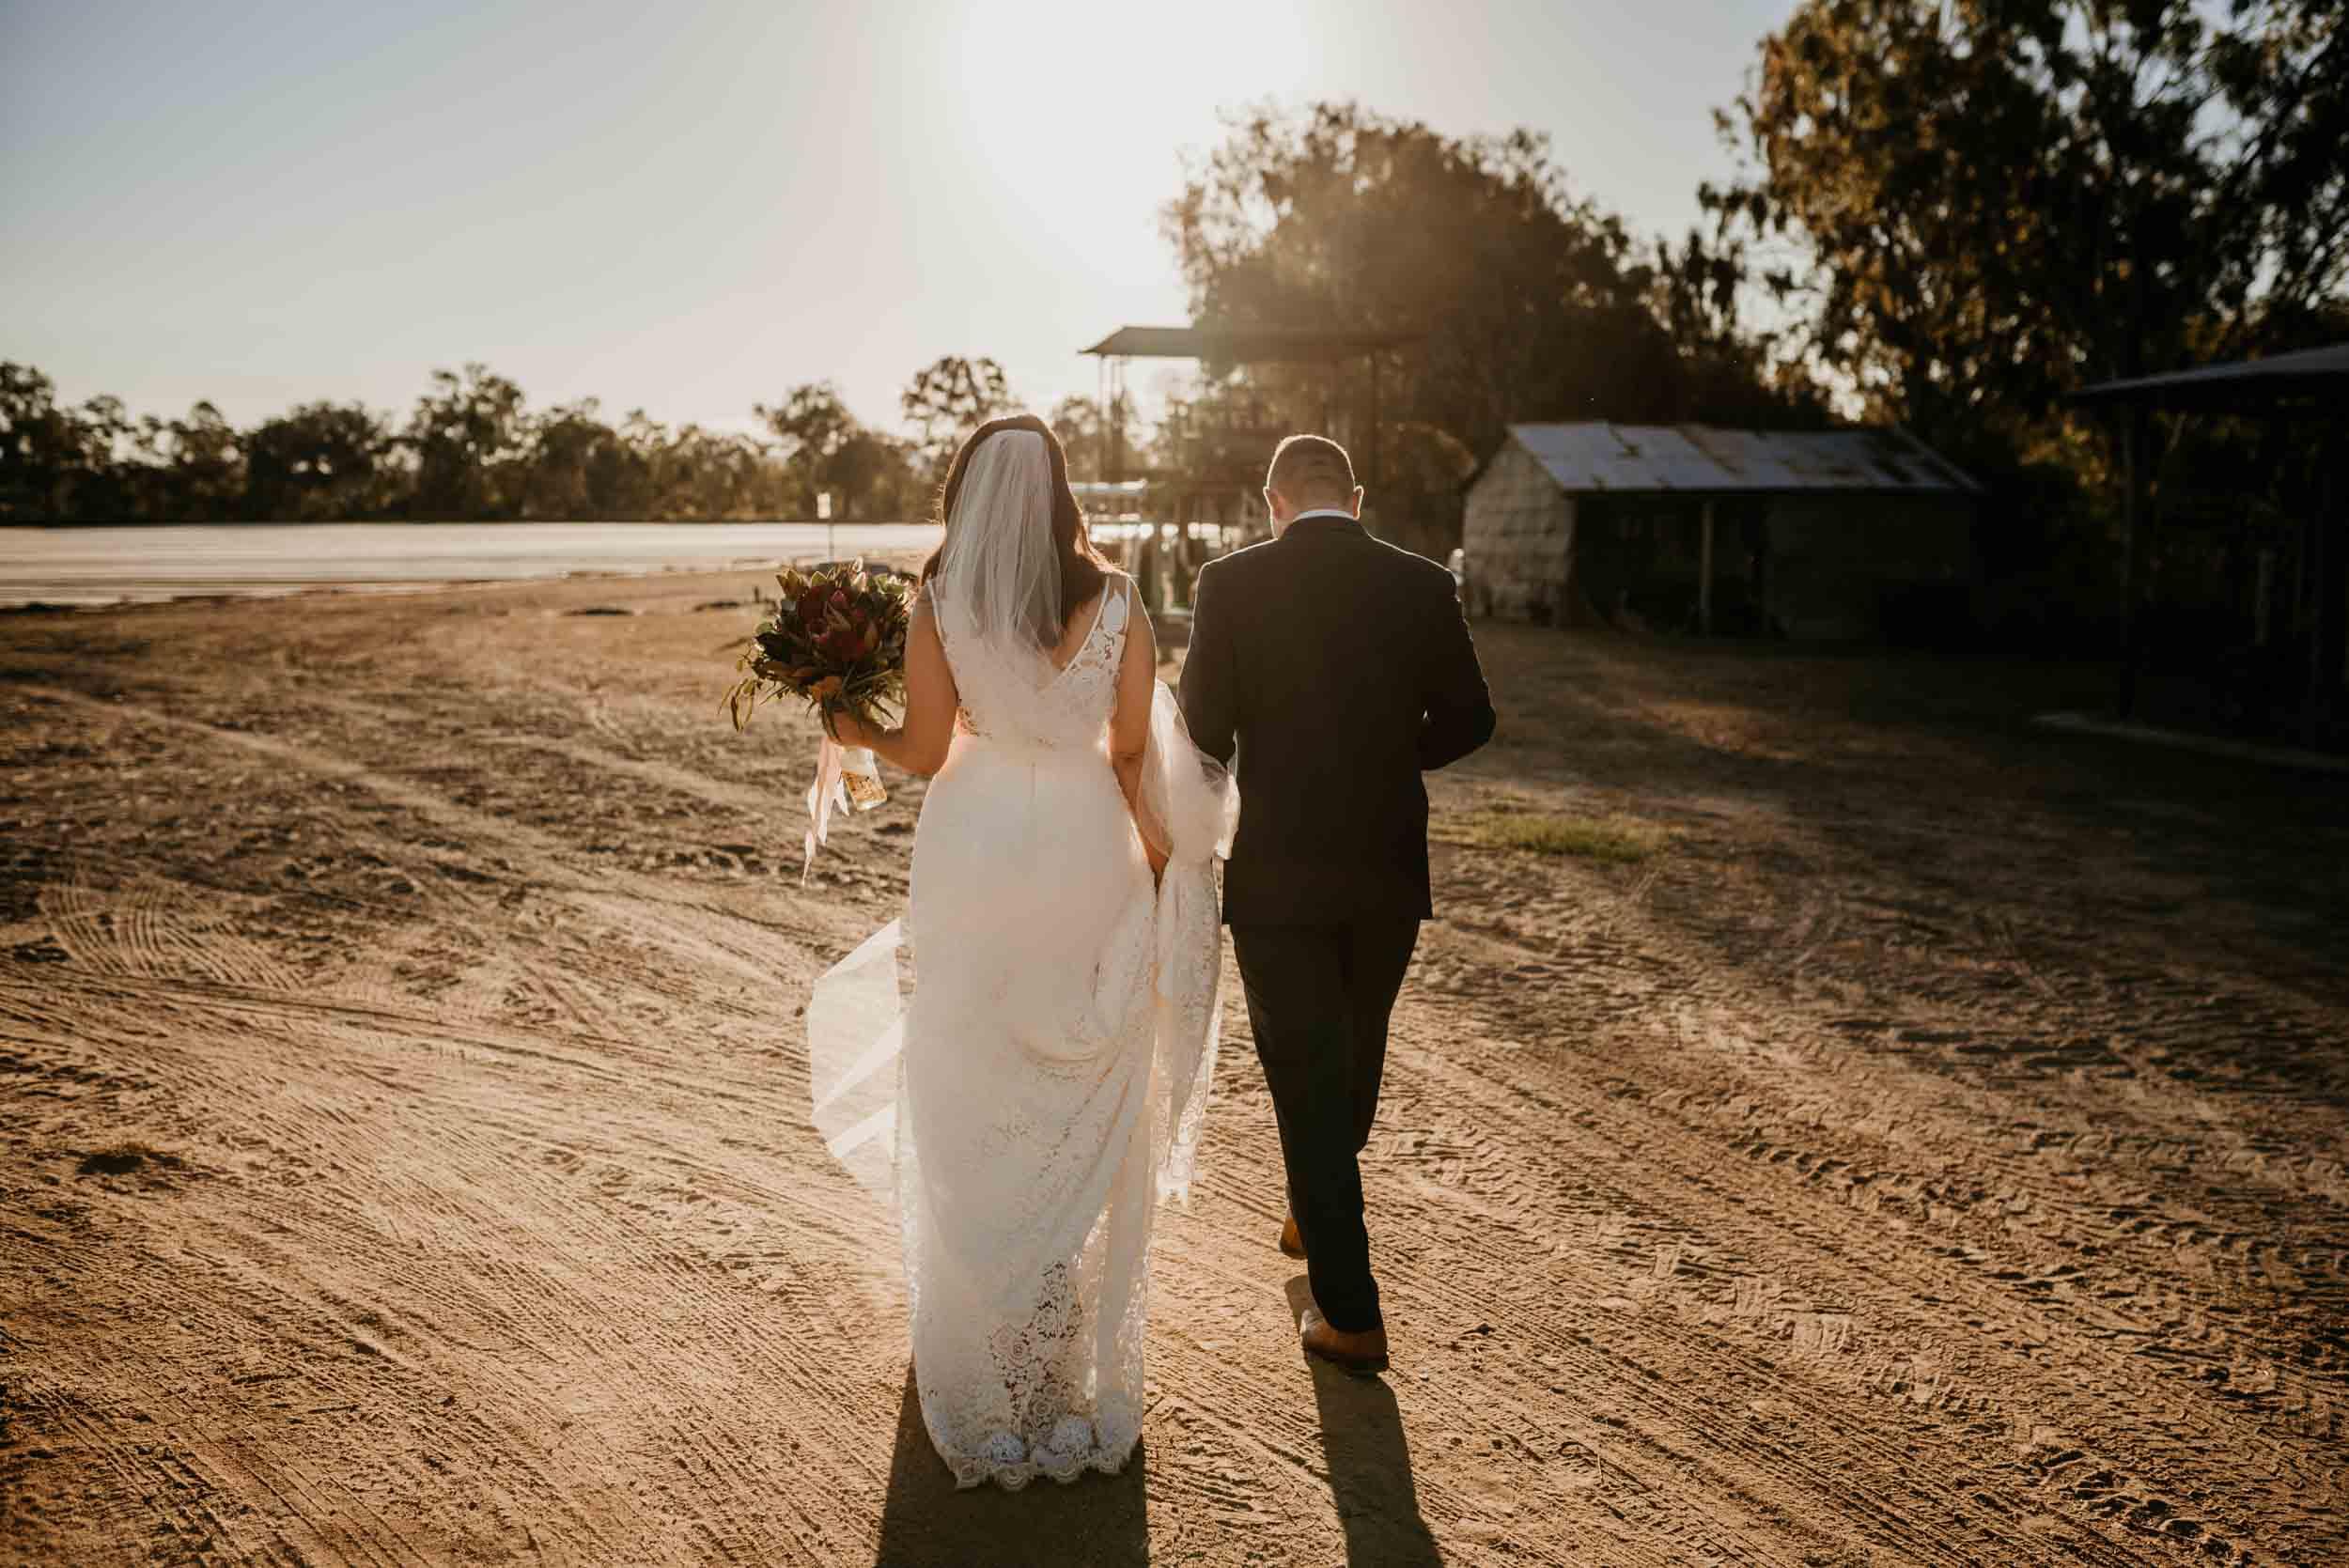 The Raw Photographer - Cairns Wedding Photographer - Atherton Tablelands - Mareeba farm Wedding - Irene Costa's Devine Bridal - Candid - Photo Package-37.jpg